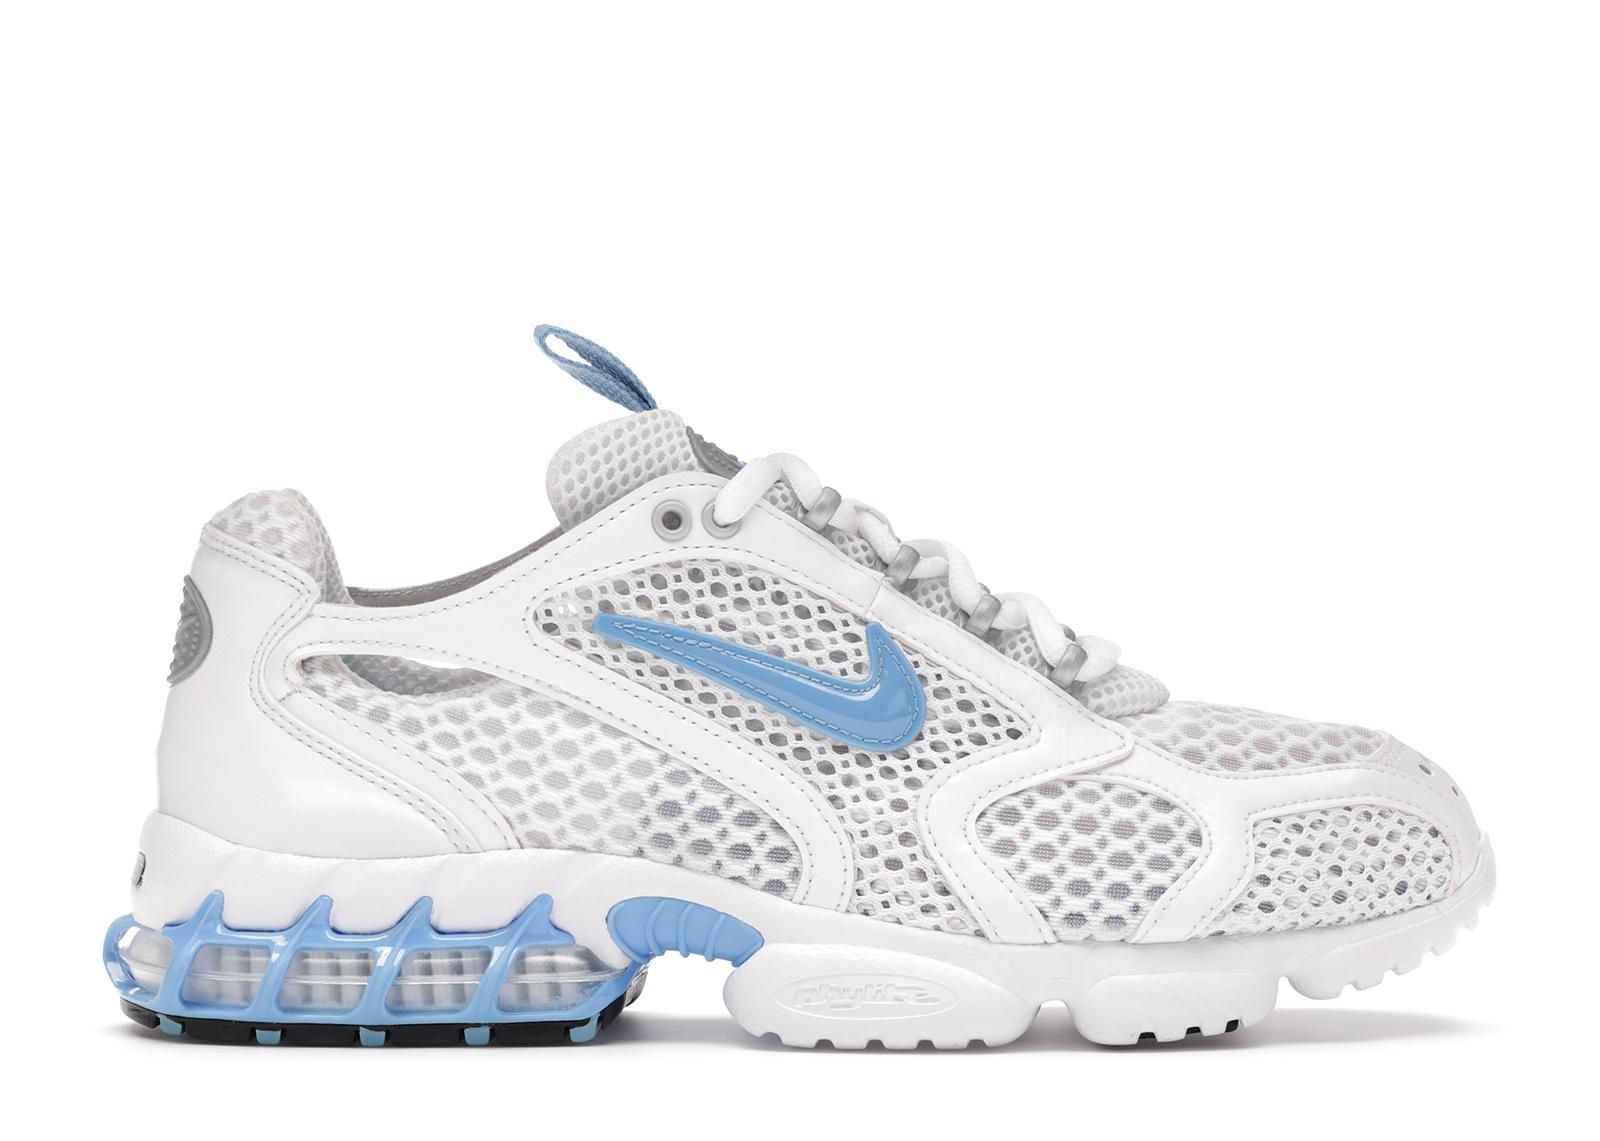 Nike Air Zoom Spiridon Cage 2 White University Blue (W) - CD3613-100